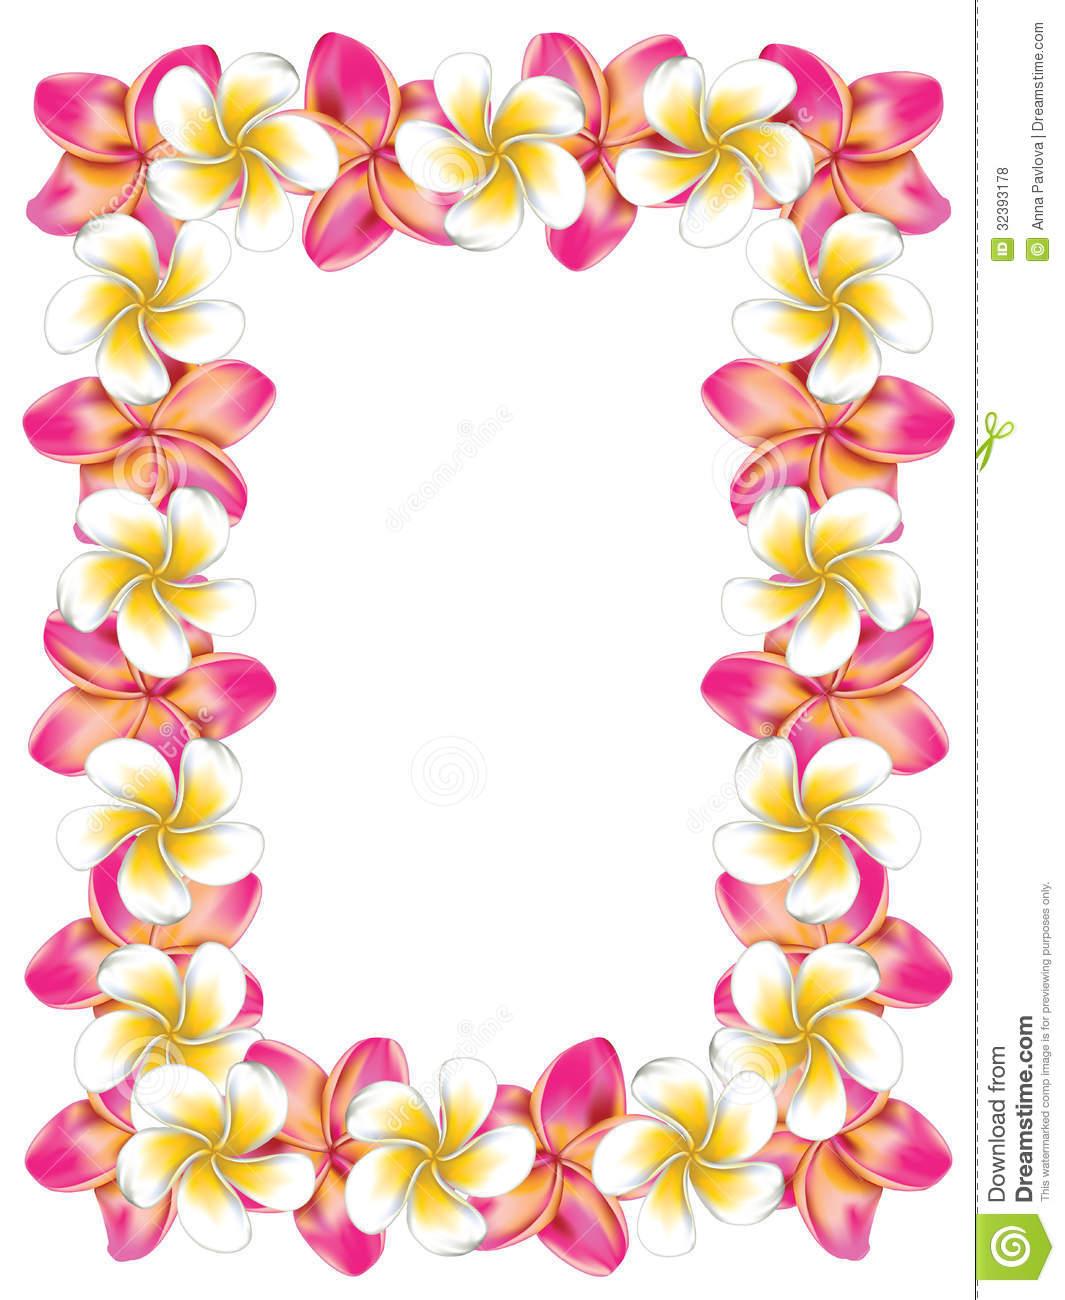 Free Hawaii Border Cliparts, Download Free Clip Art, Free Clip Art.